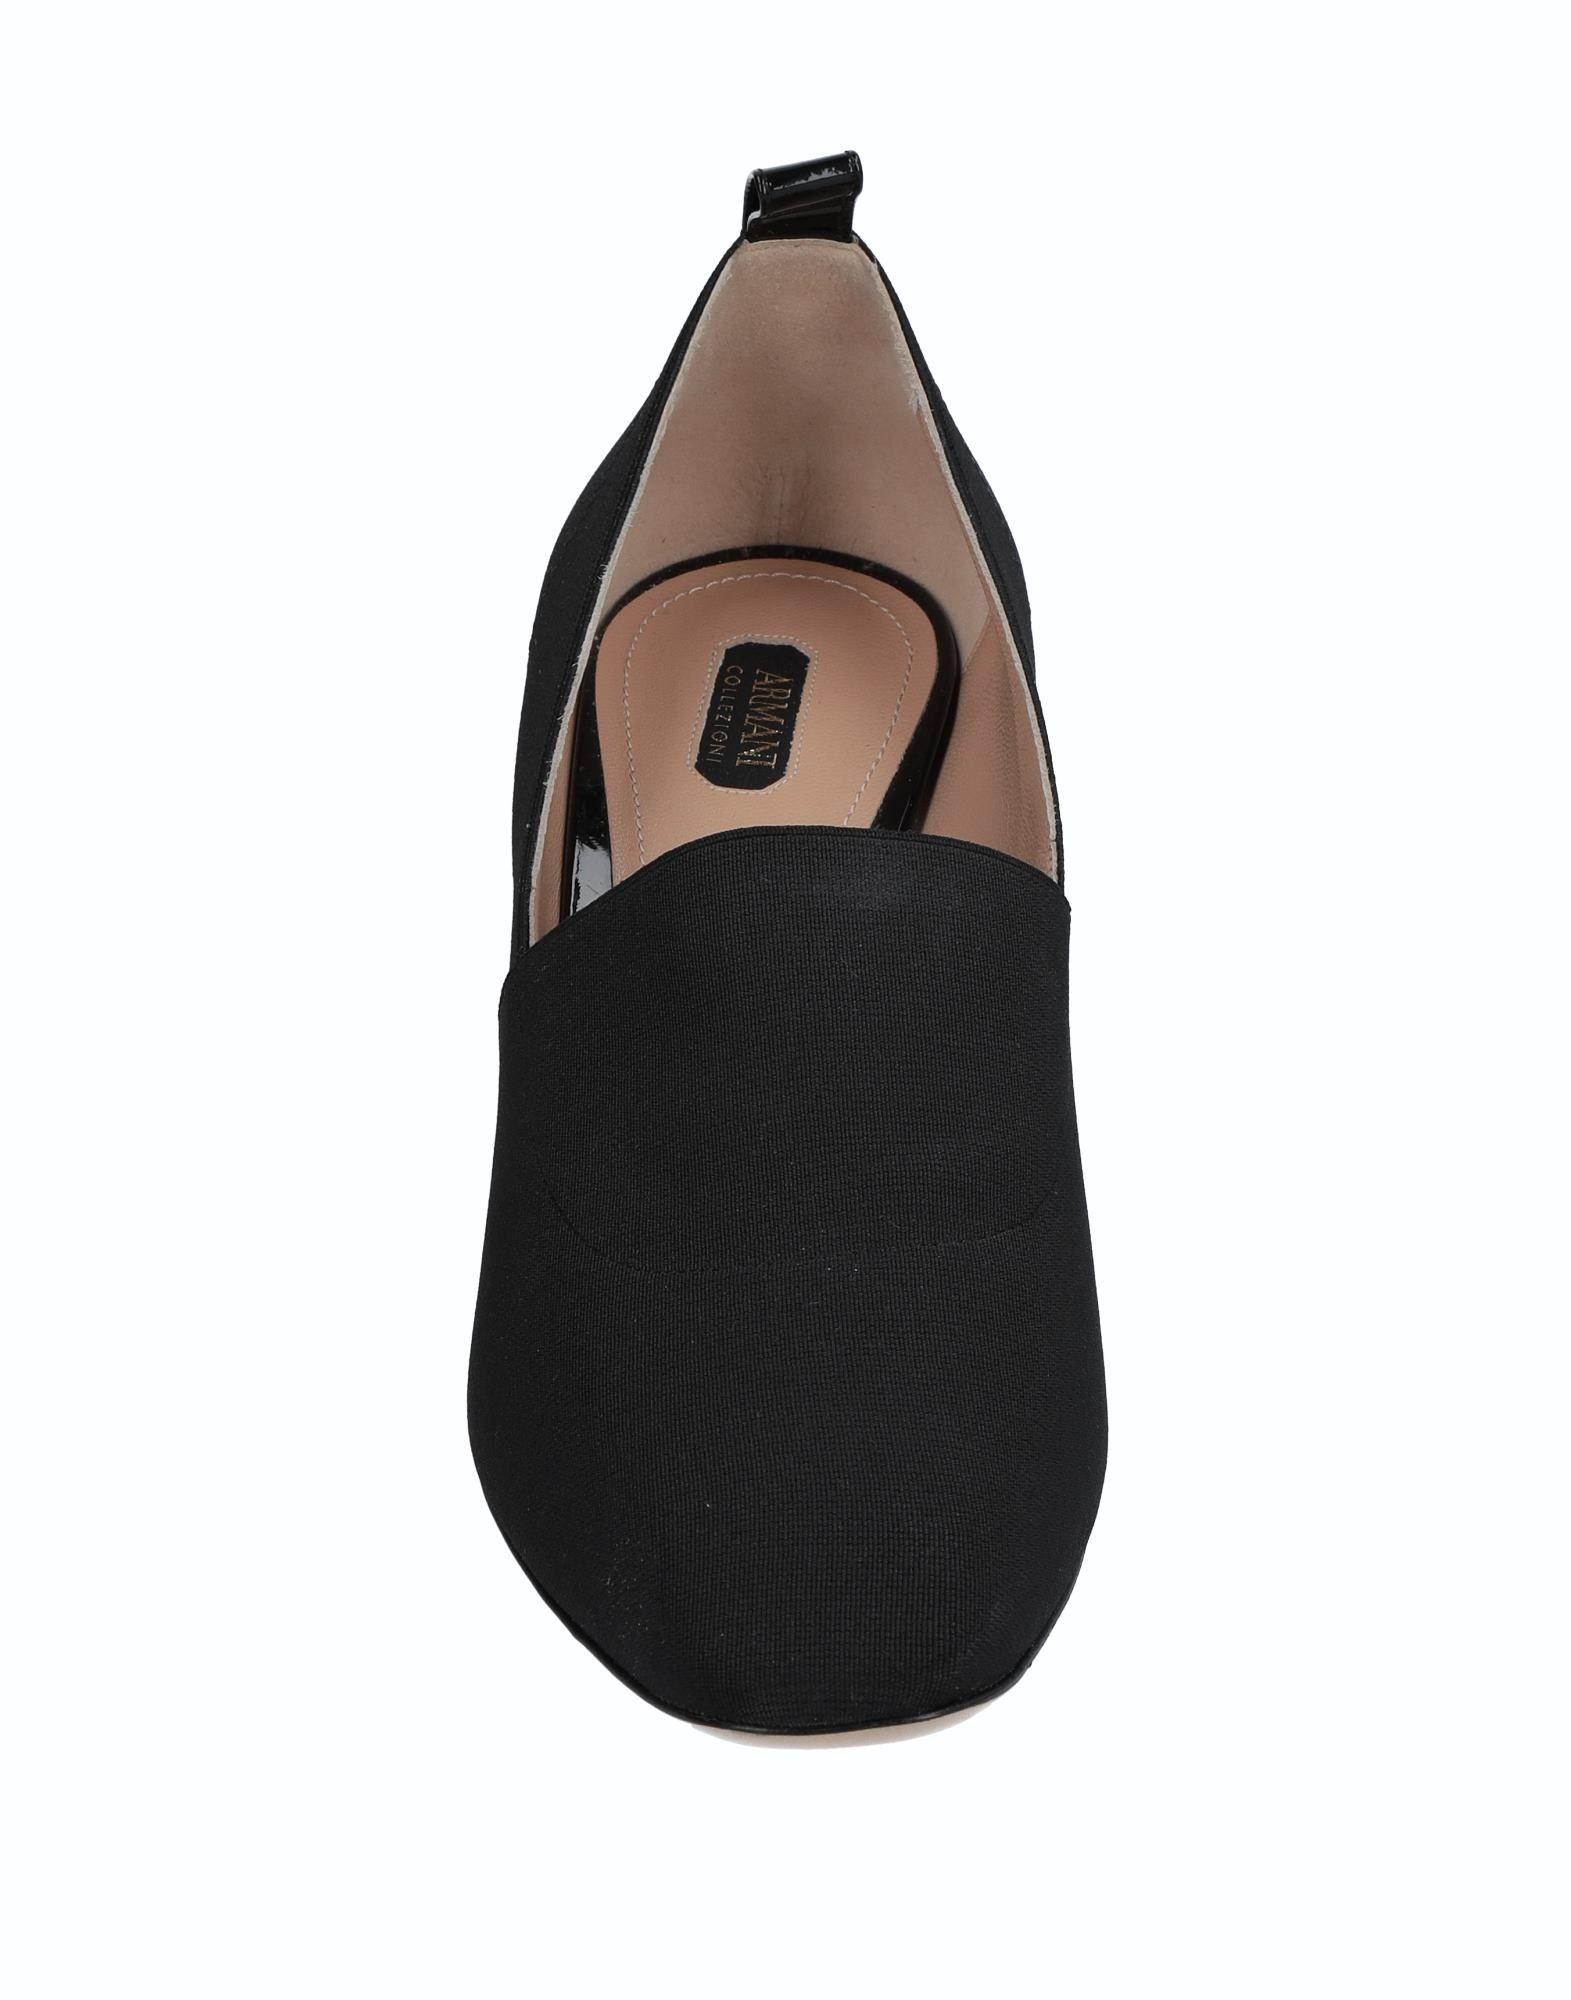 Armani Collezioni 11524015ULGut Mokassins Damen  11524015ULGut Collezioni aussehende strapazierfähige Schuhe f0e028